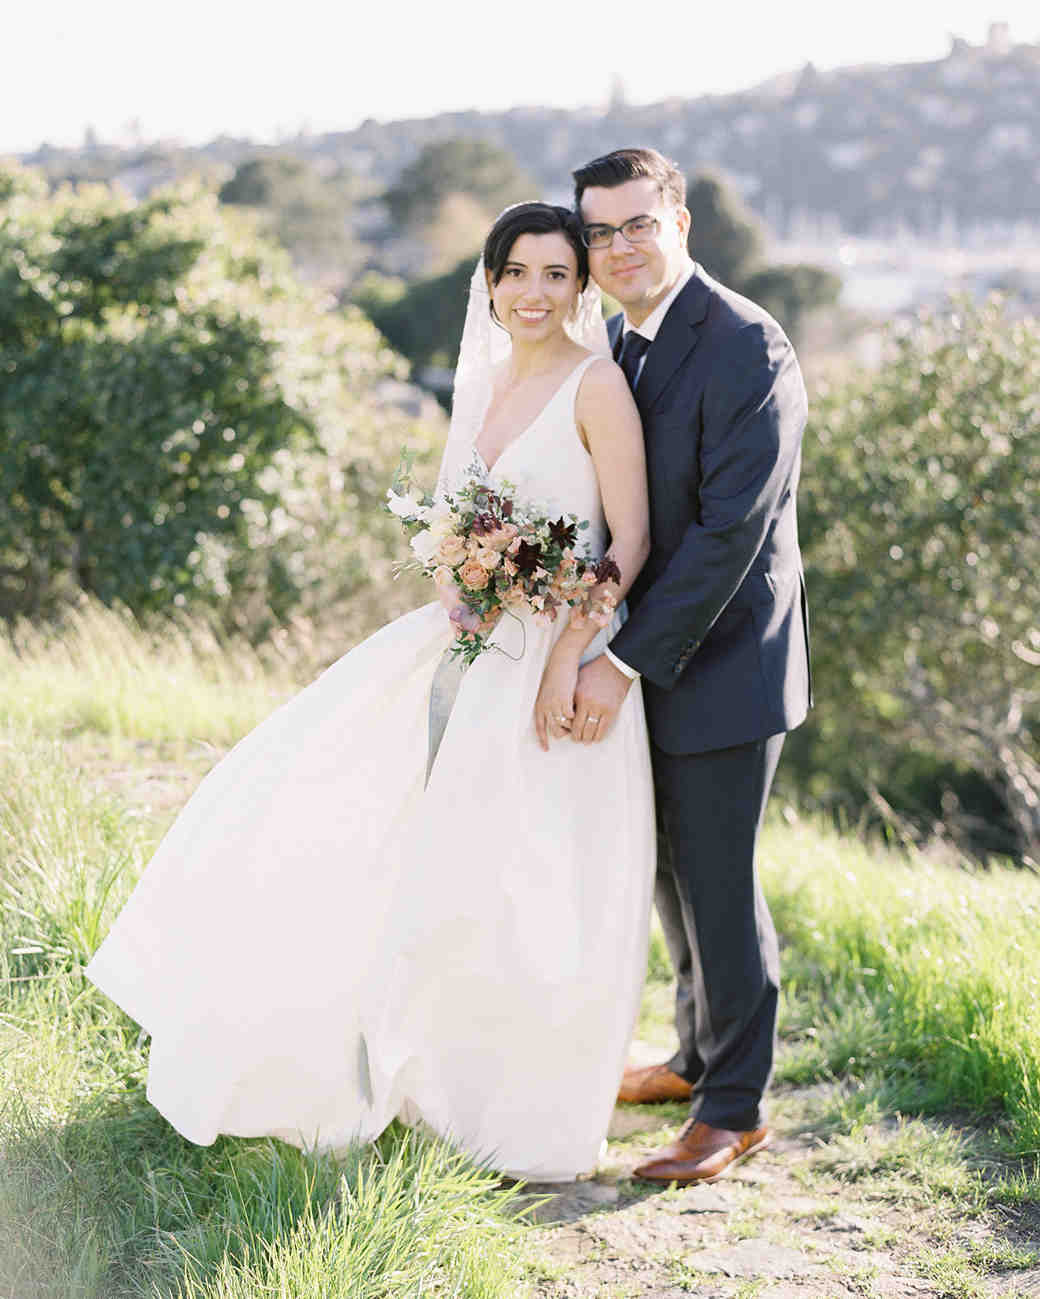 olivia-brett-wedding-couple-355-0119_vert.jpg